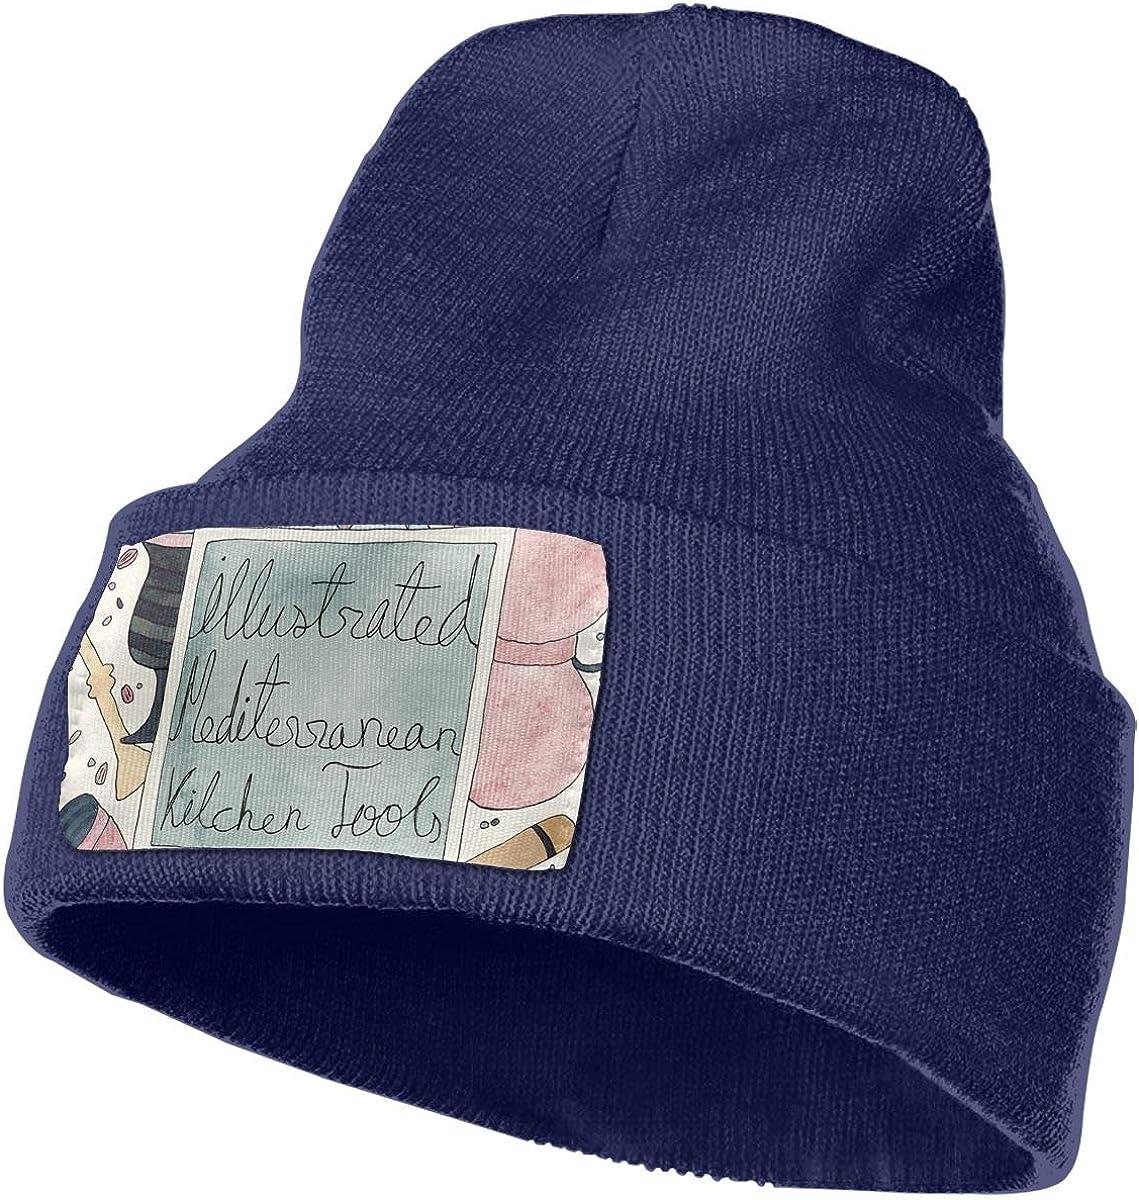 ONHIM Illustrated Mediterranean Kitchen Tools Men /& Women Soft Warm Kintted Beanie Hat Slouchy Jogging Beanie